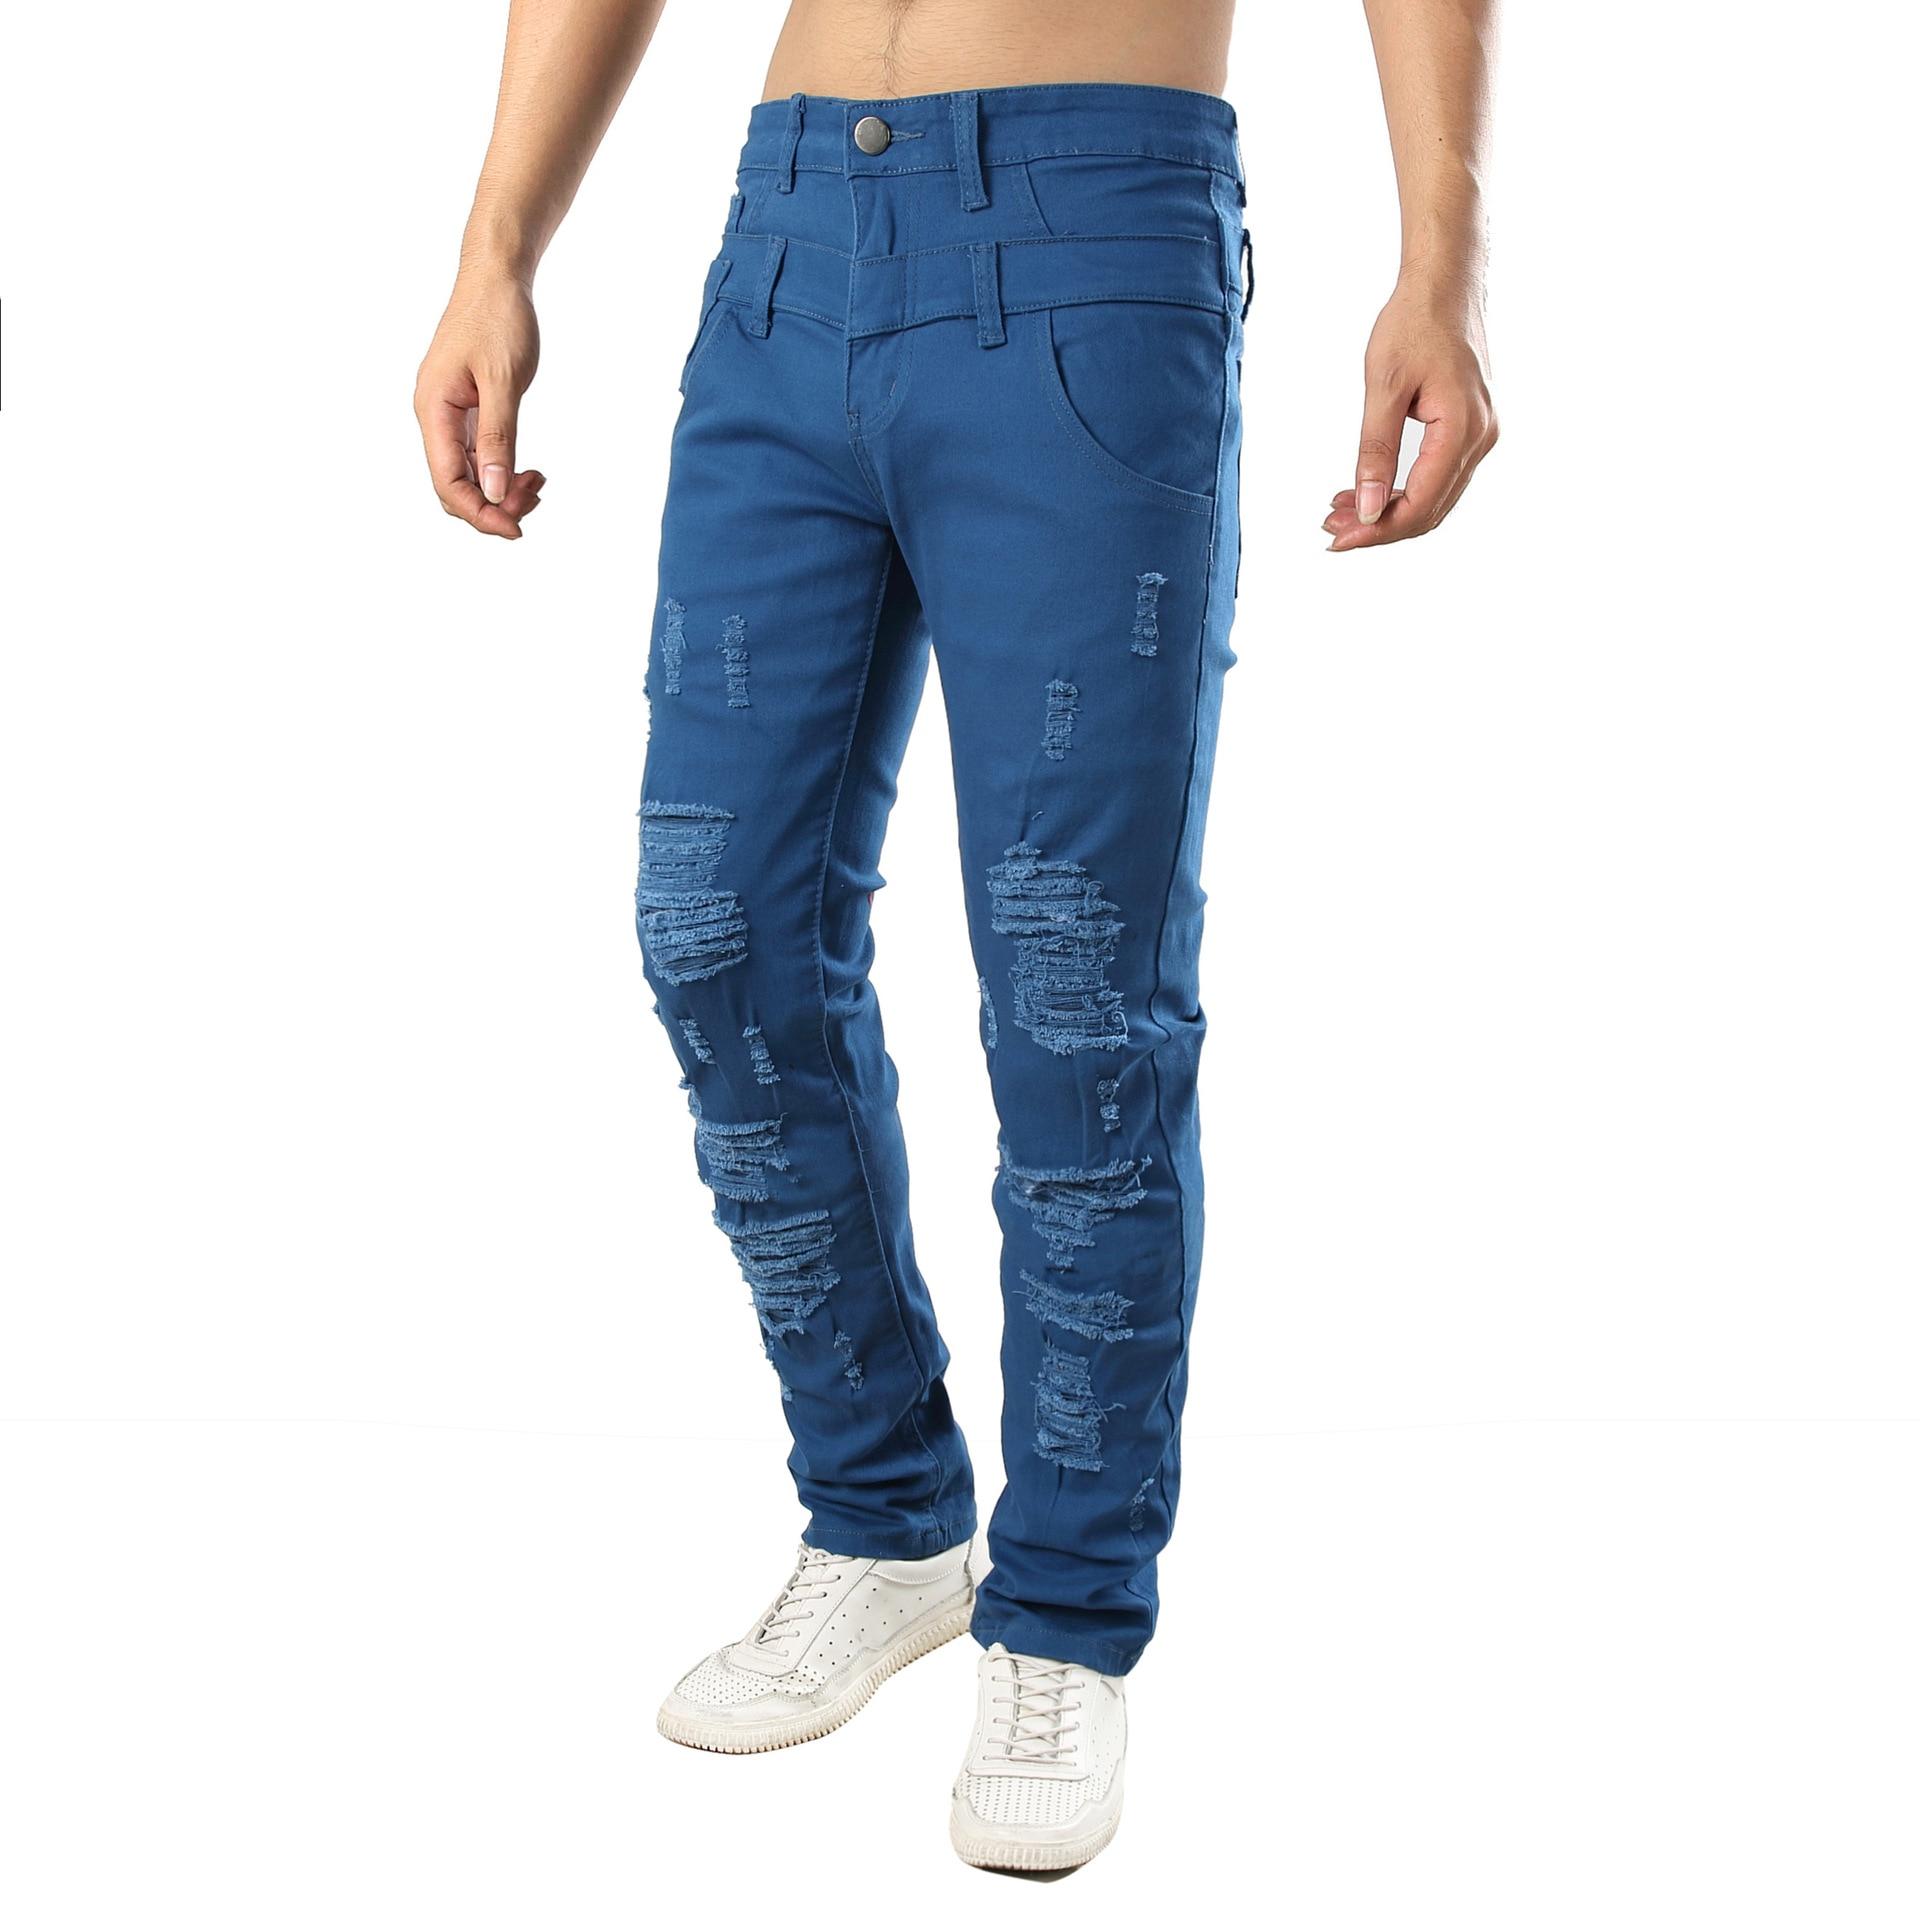 Mens beggar Hole denim jeans retro slim Elasticity denim jeans  pants trousers